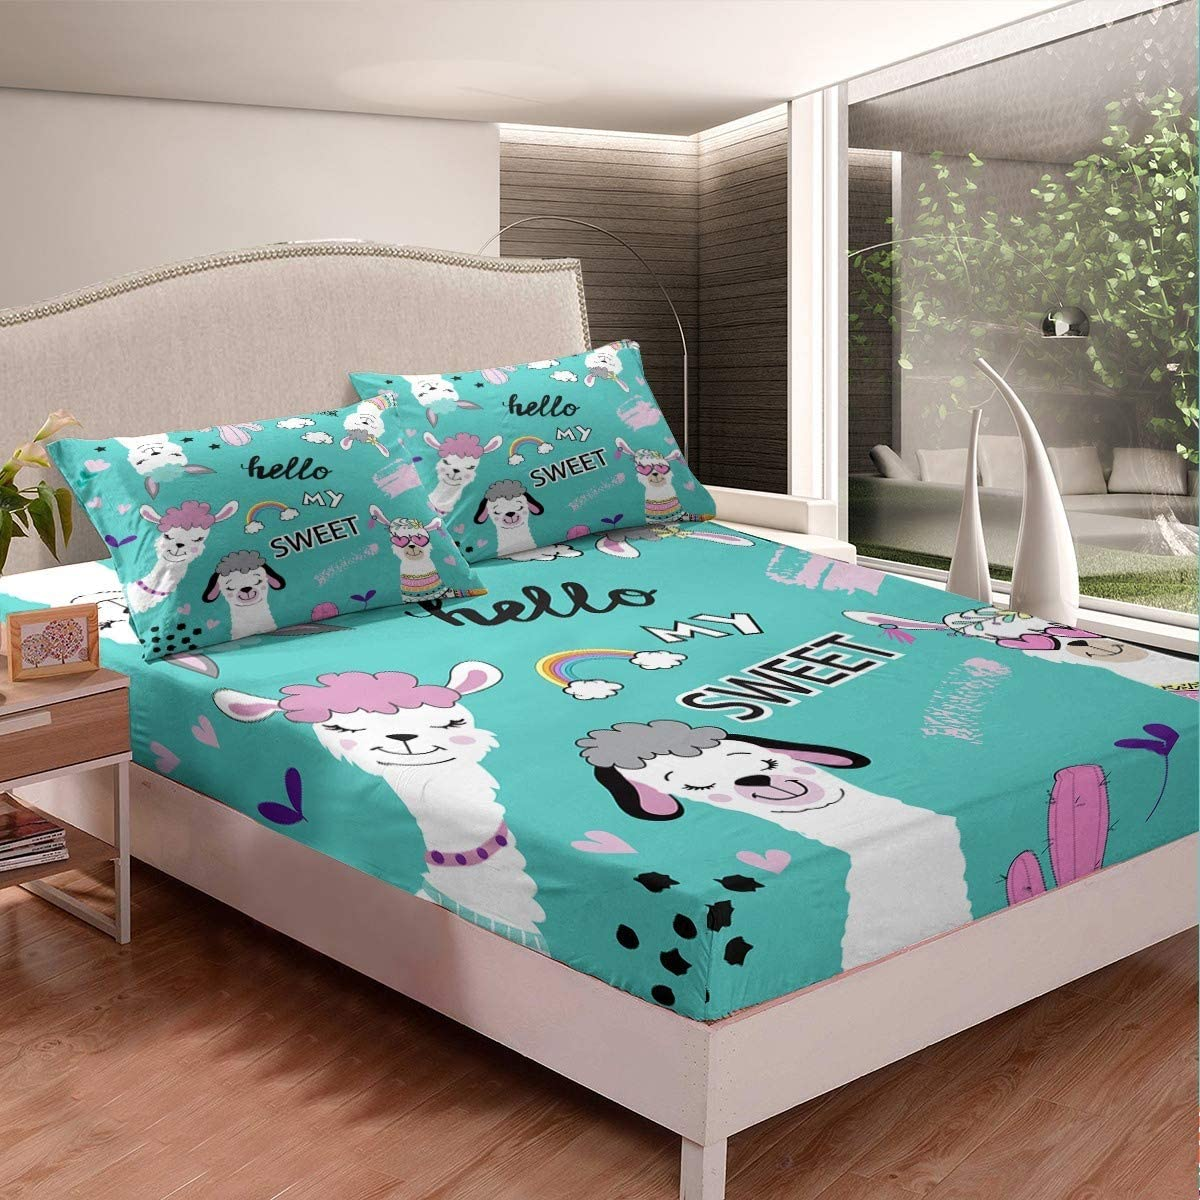 Feelyou Llama Alpaca Fitted Sheet Cute Llama Bedding Set Cartoon Llama Alpaca Design Bed Sheet Set for Boys Girls Children Teens Animal Theme Bed Cover Bedroom Decor Queen Size with 2 Pillow Case